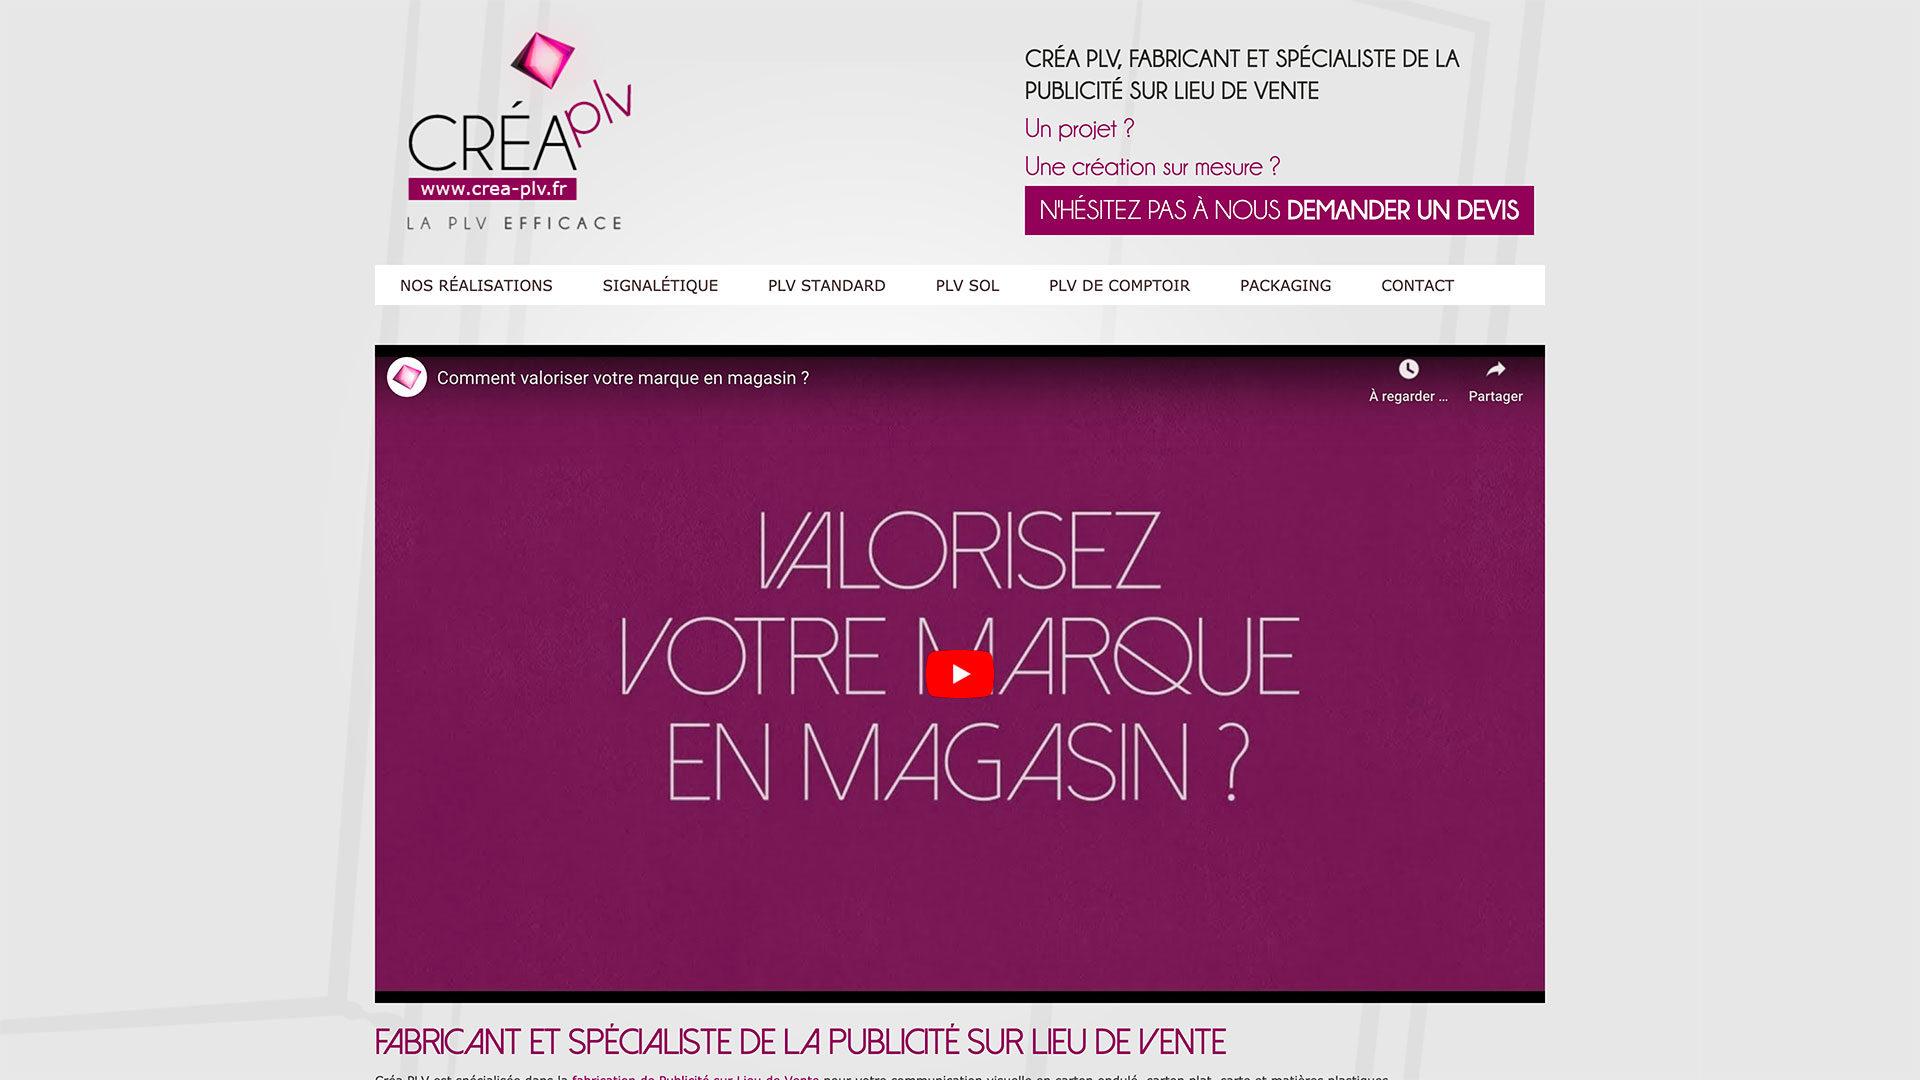 crea-plv.fr